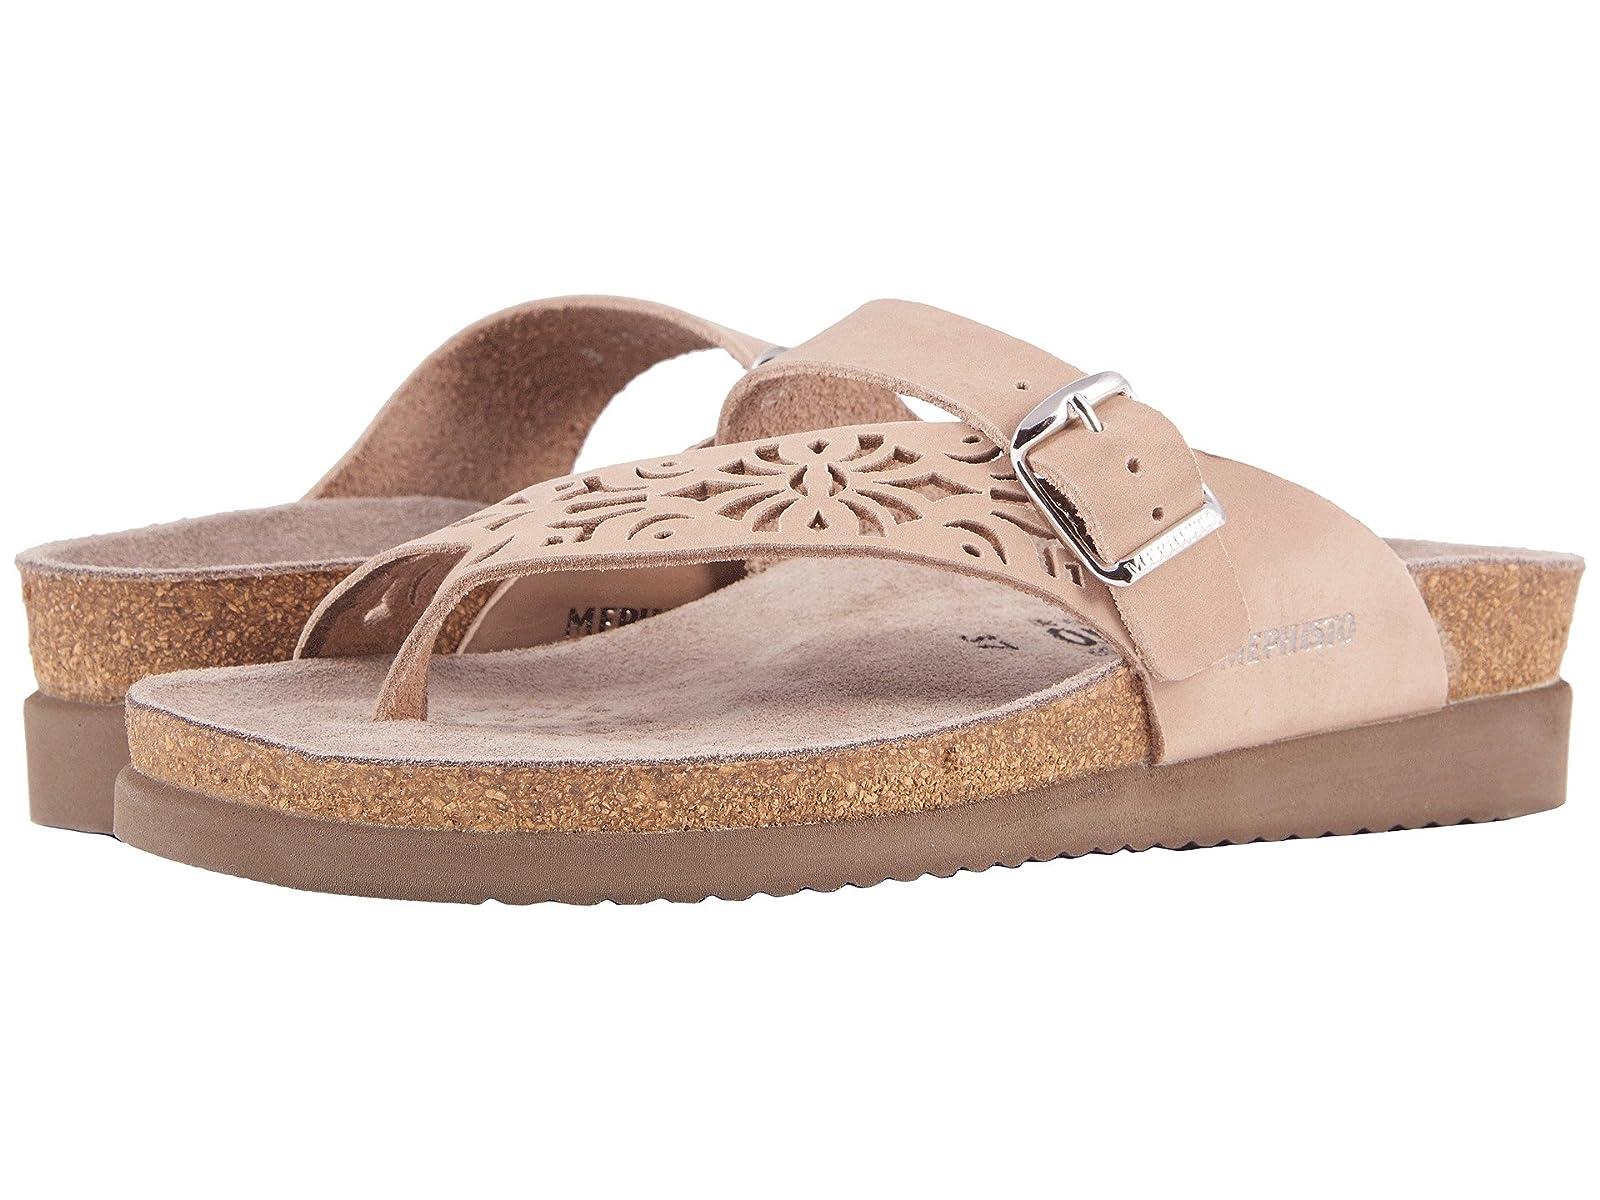 Mephisto Helen Perf NubuckAtmospheric grades have affordable shoes